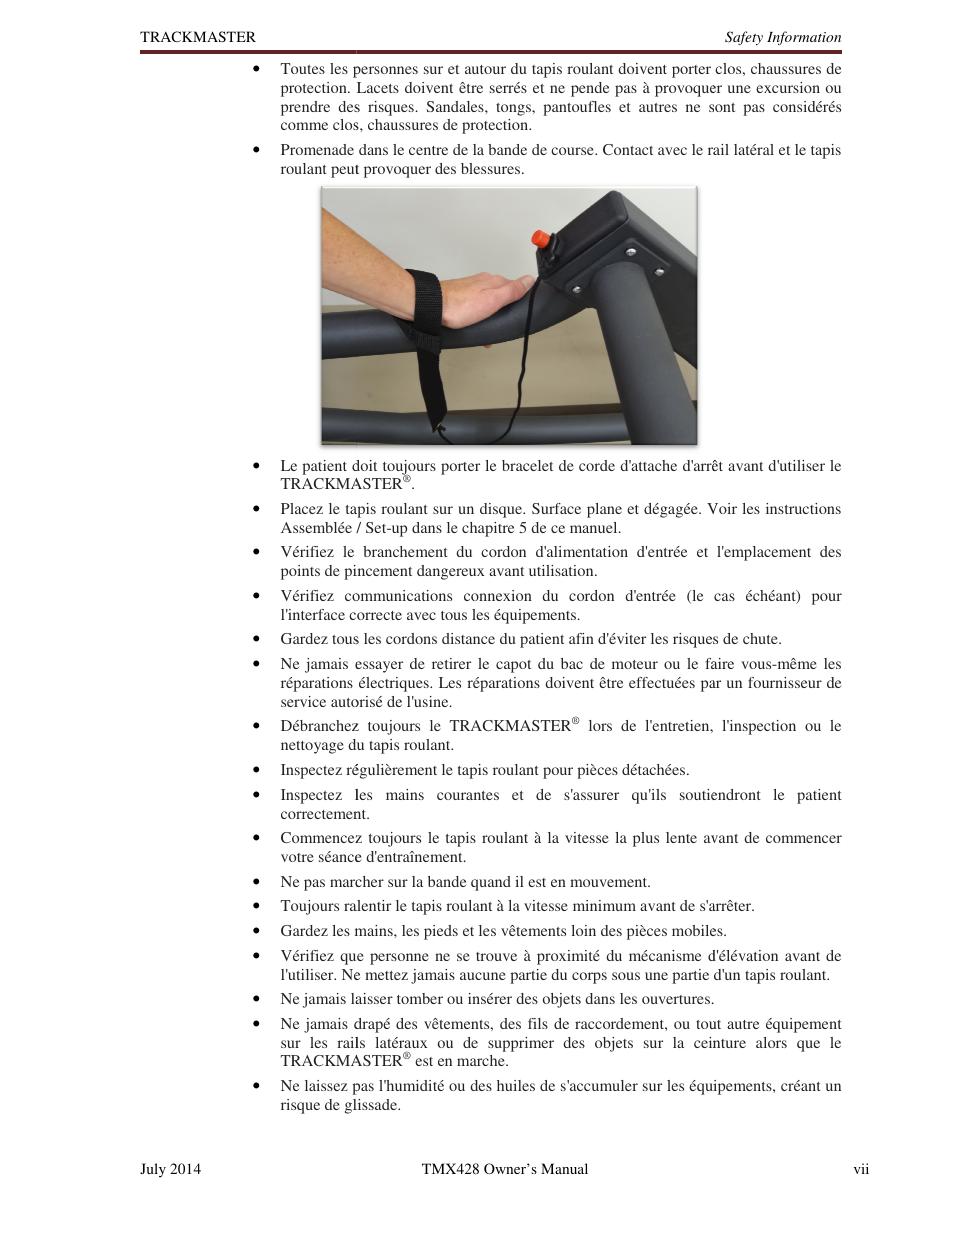 Welch Allyn TMX428CP Trackmaster Medical Treadmill - User